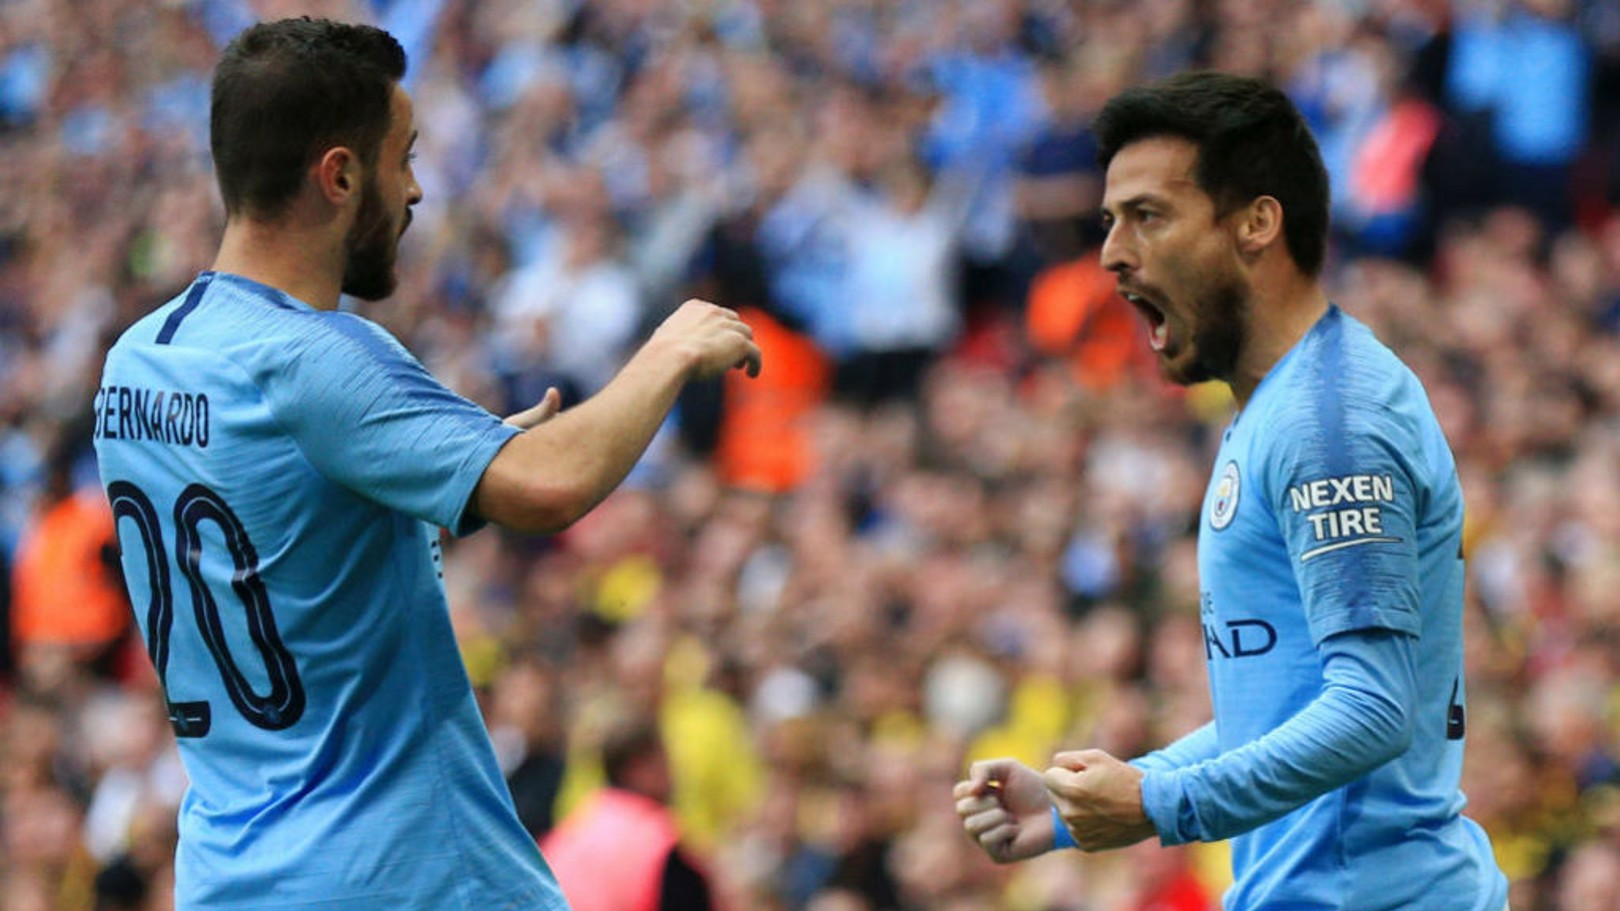 Bernardo keen to further learn from David Silva